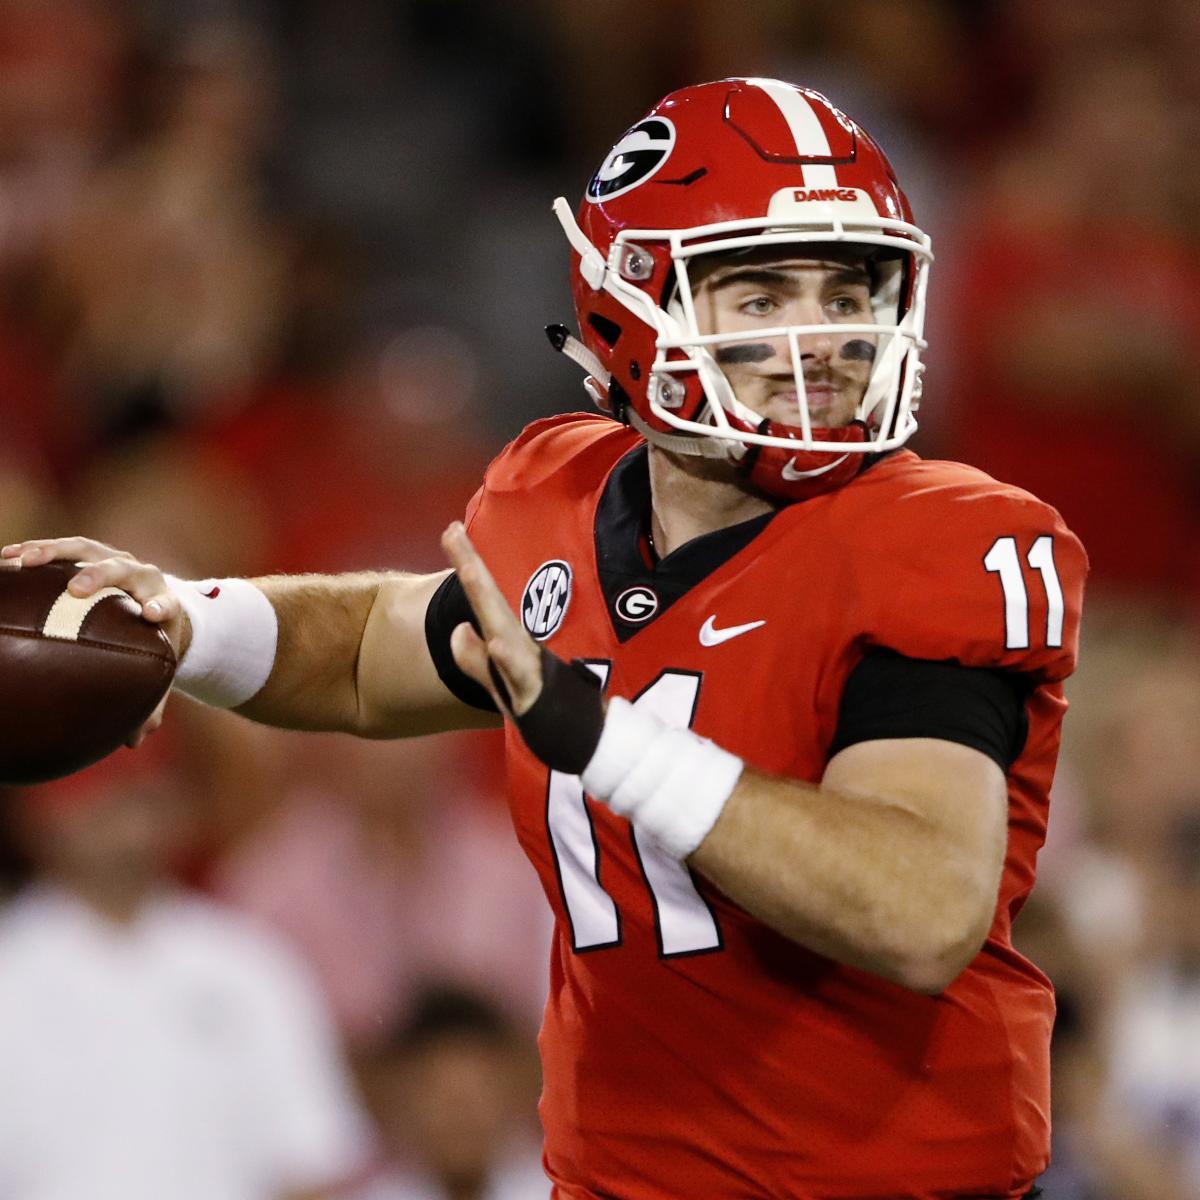 College Football Odds Week 7: Picks, Score Predictions for Top 25 Teams